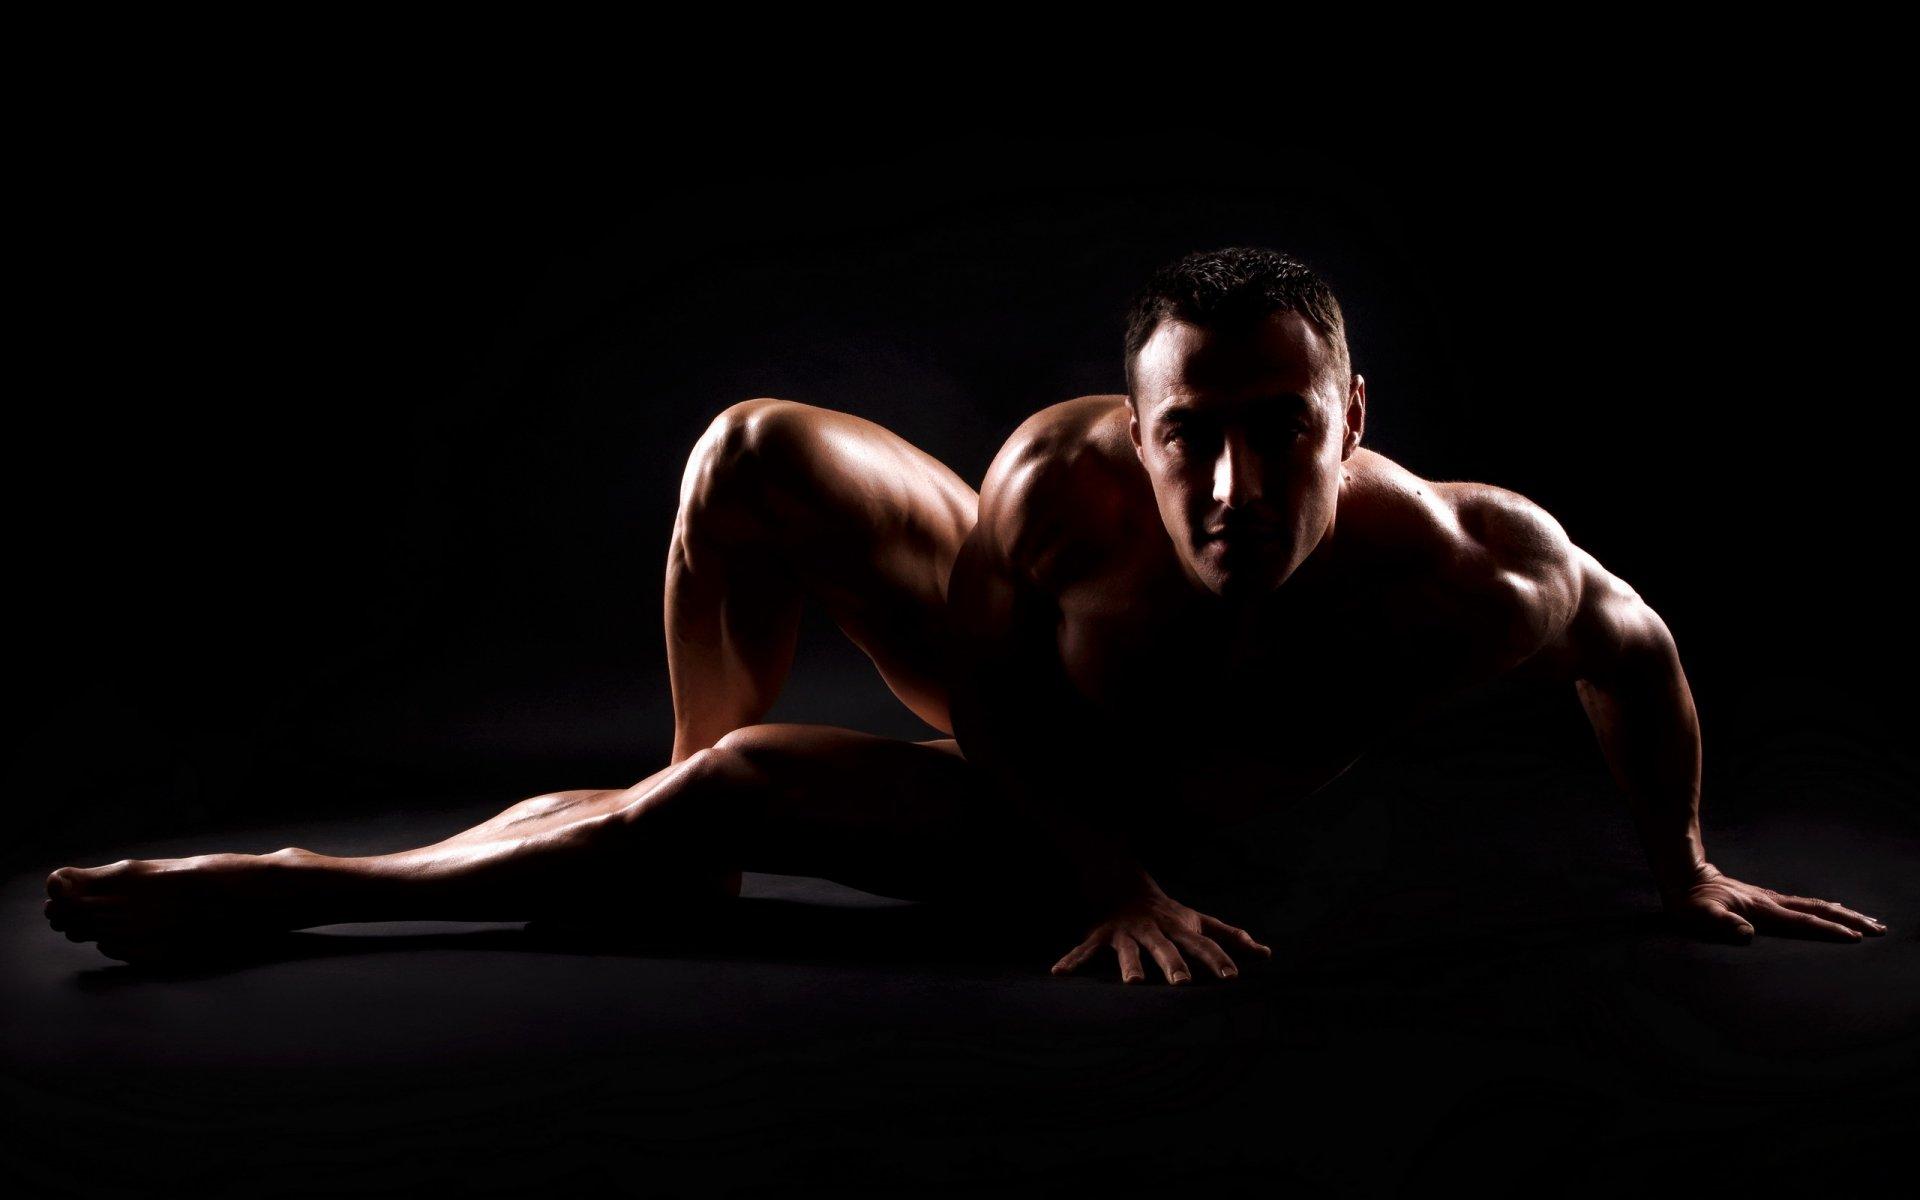 Sherry carter nude